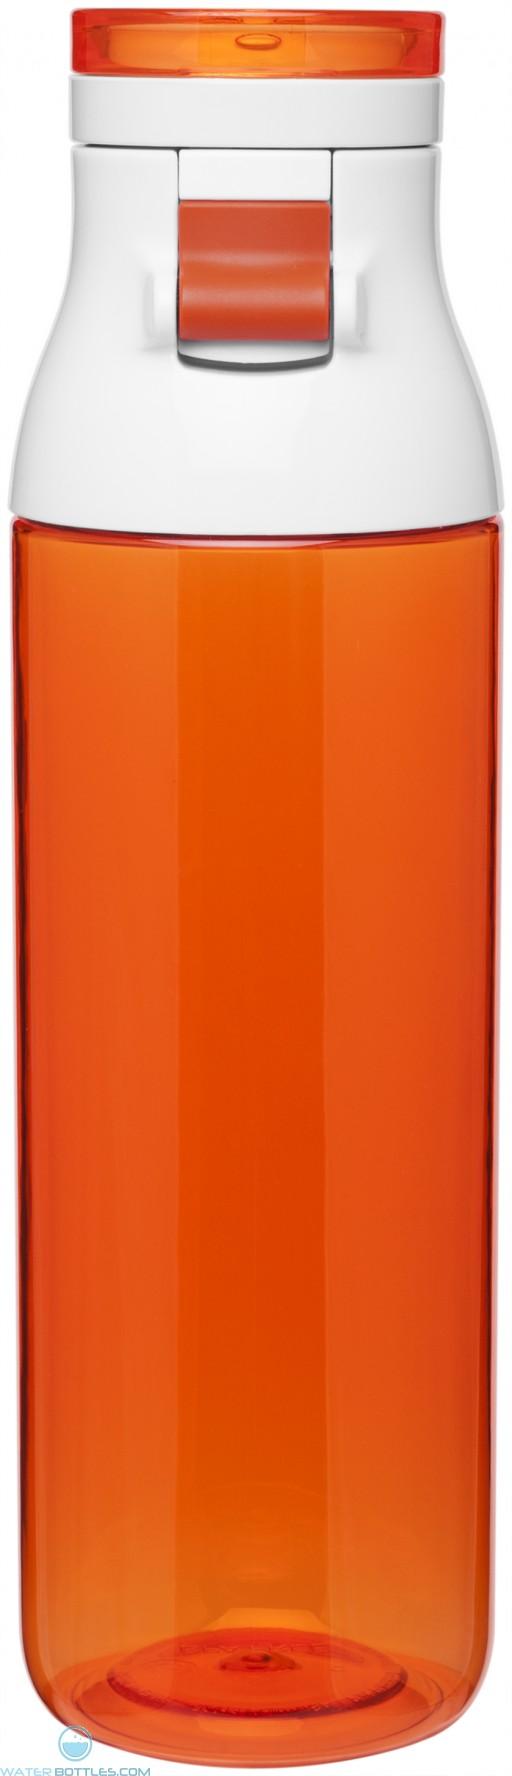 24 oz Contigo Jackson Tritan Water Bottles-Orange